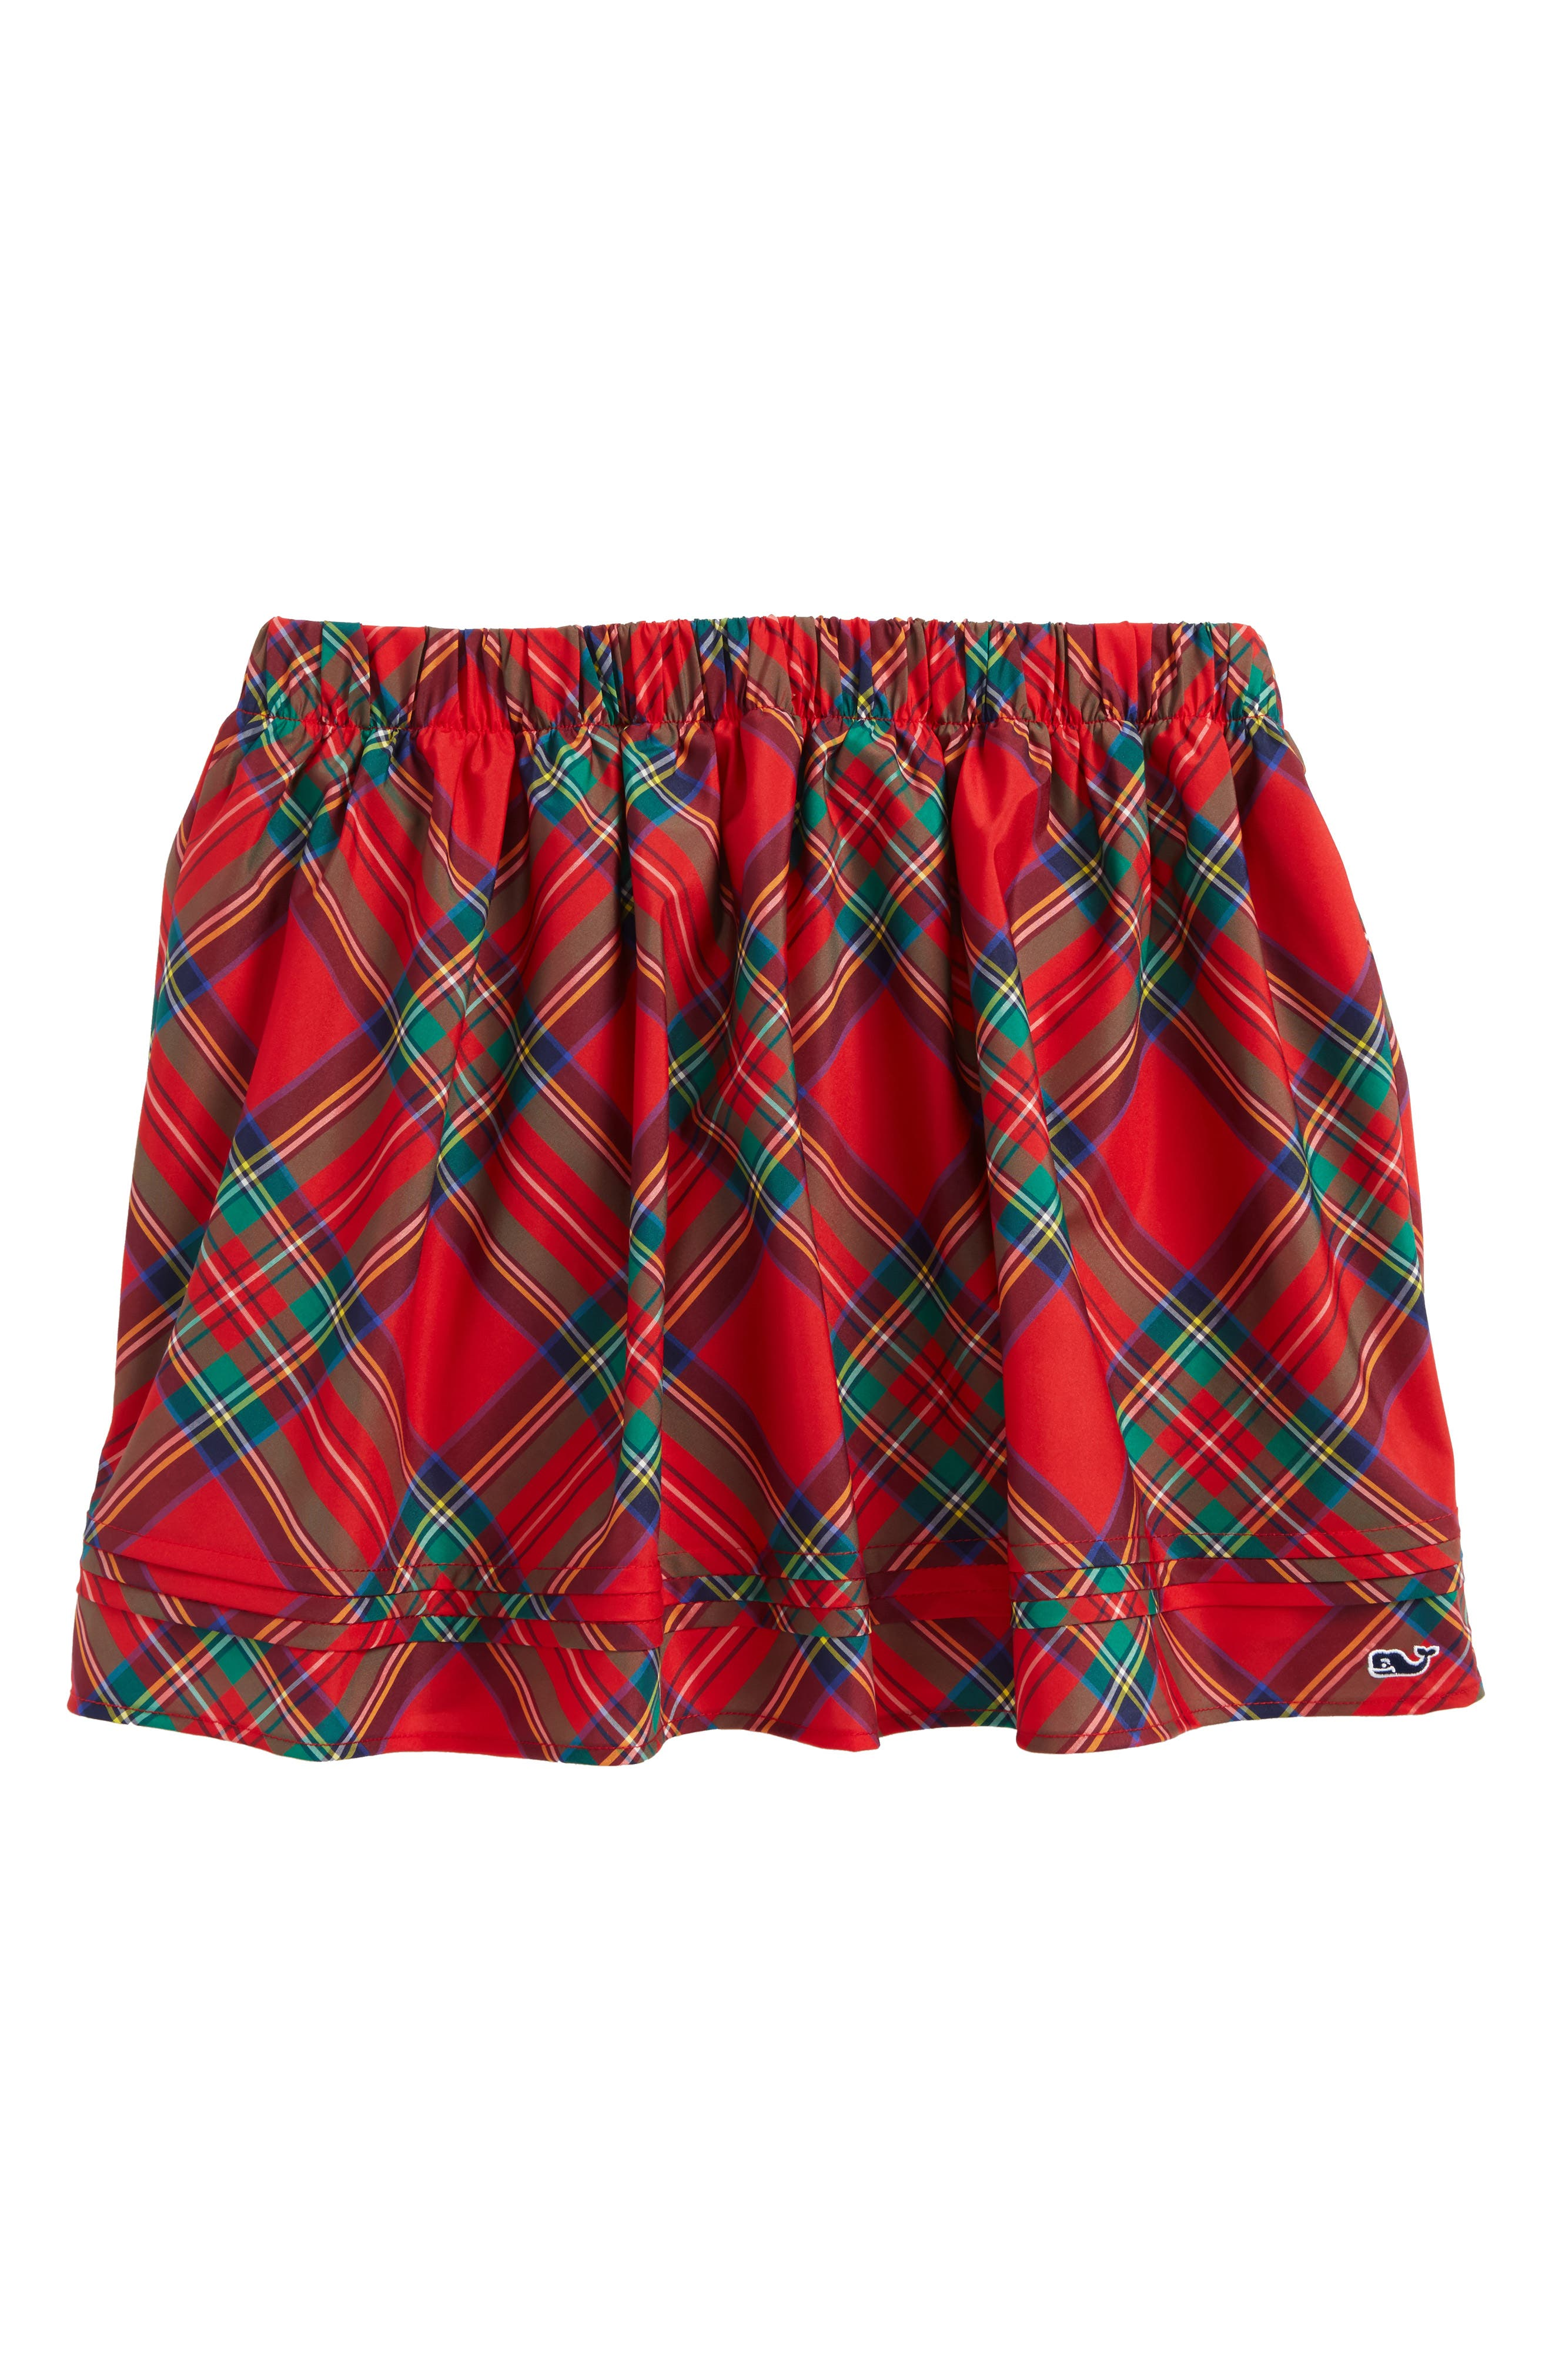 Jolly Plaid Holiday Skirt,                         Main,                         color, 634